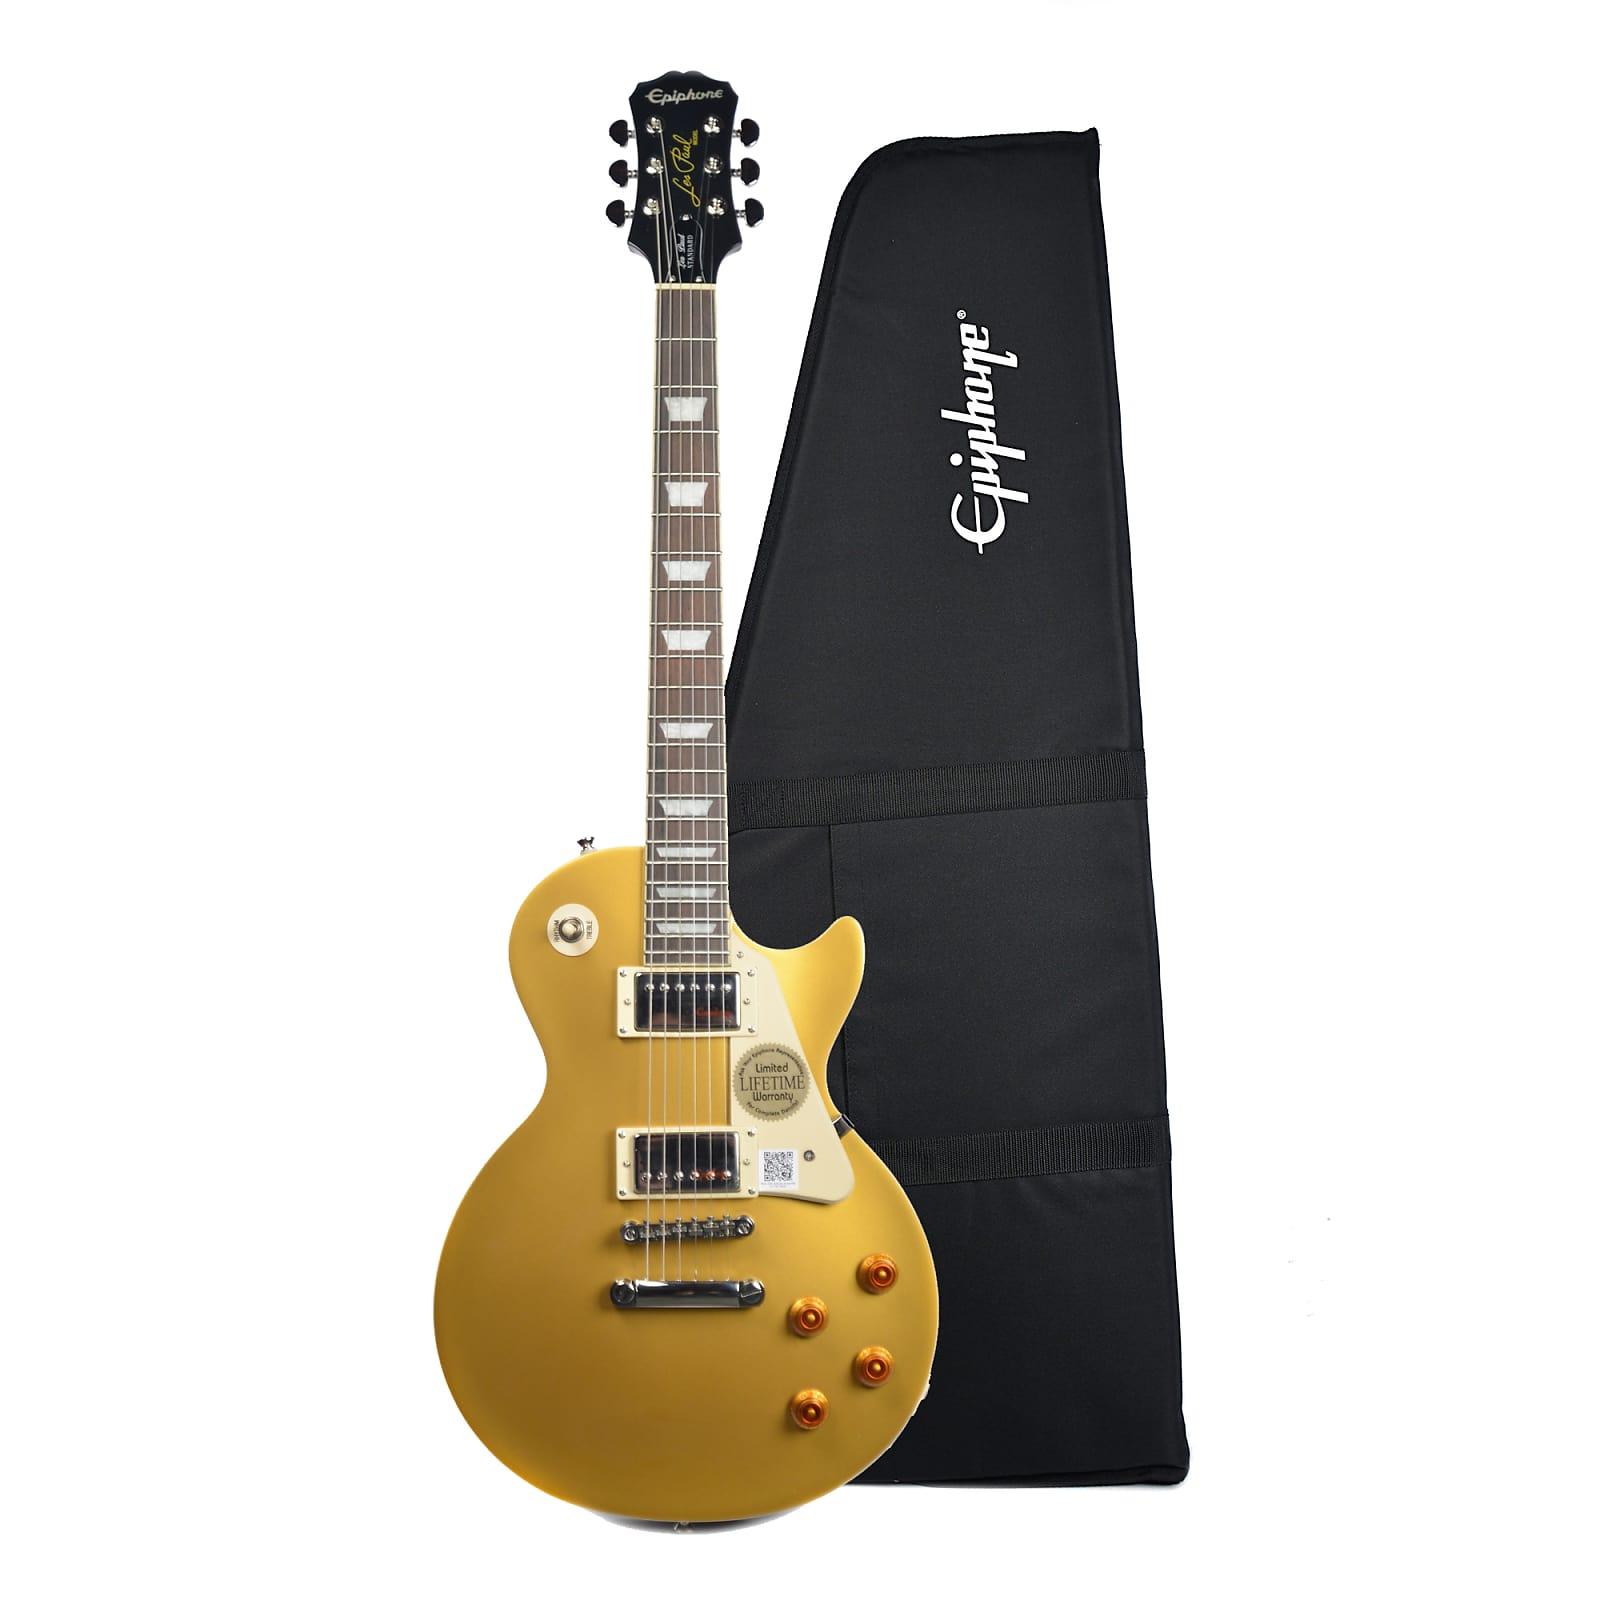 Epiphone Les Paul Standard Metallic Gold W Premium Gig Bag